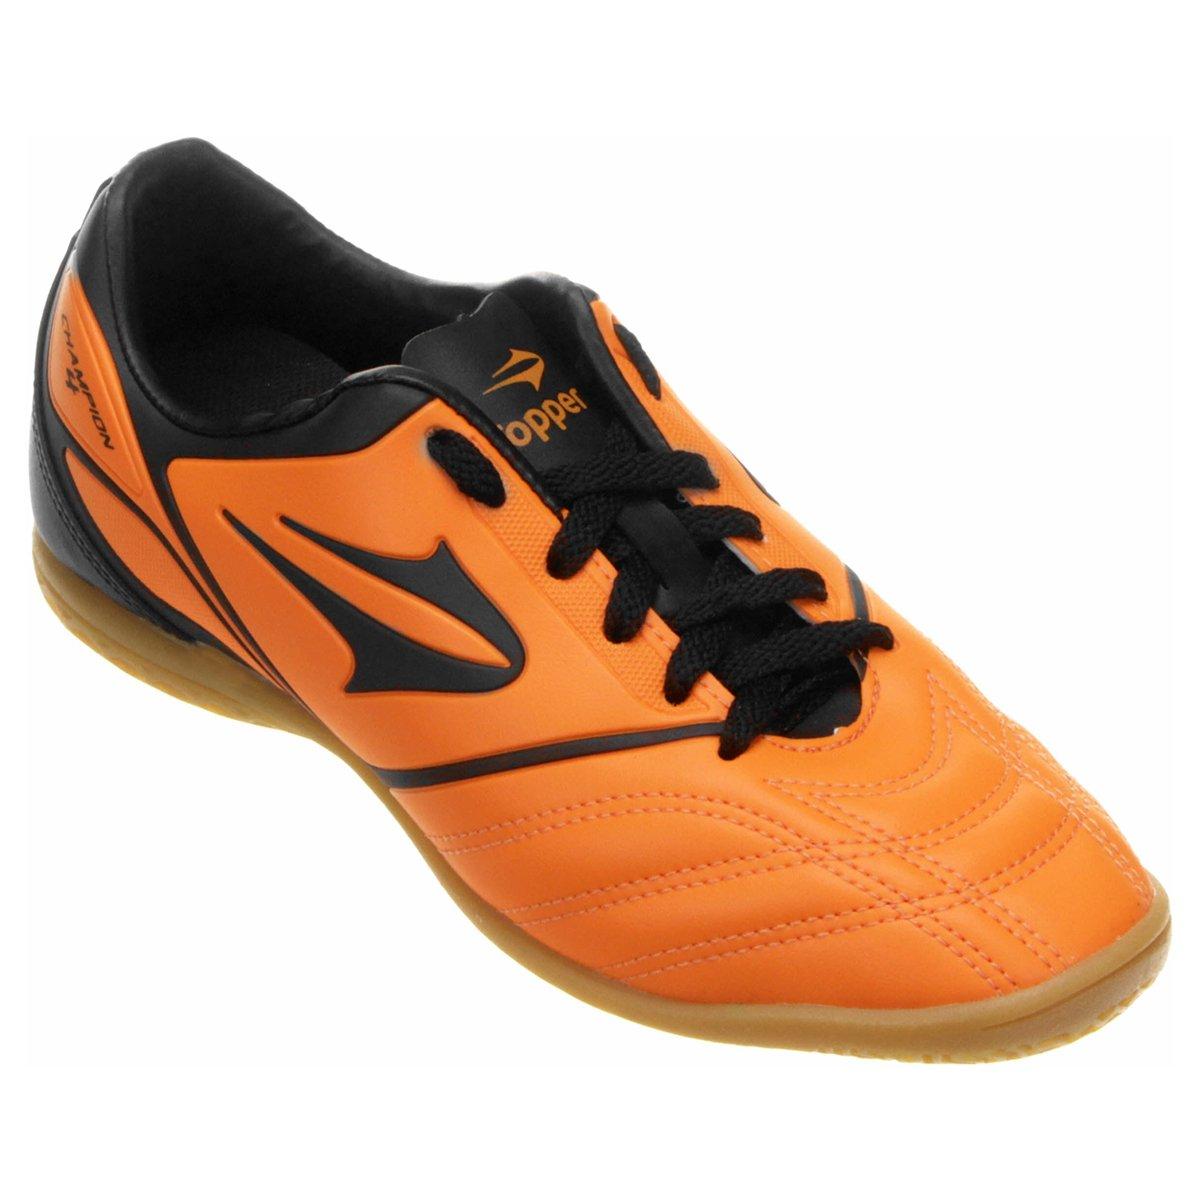 ab8b91e201 Chuteira Topper Champion 4 Futsal - Compre Agora